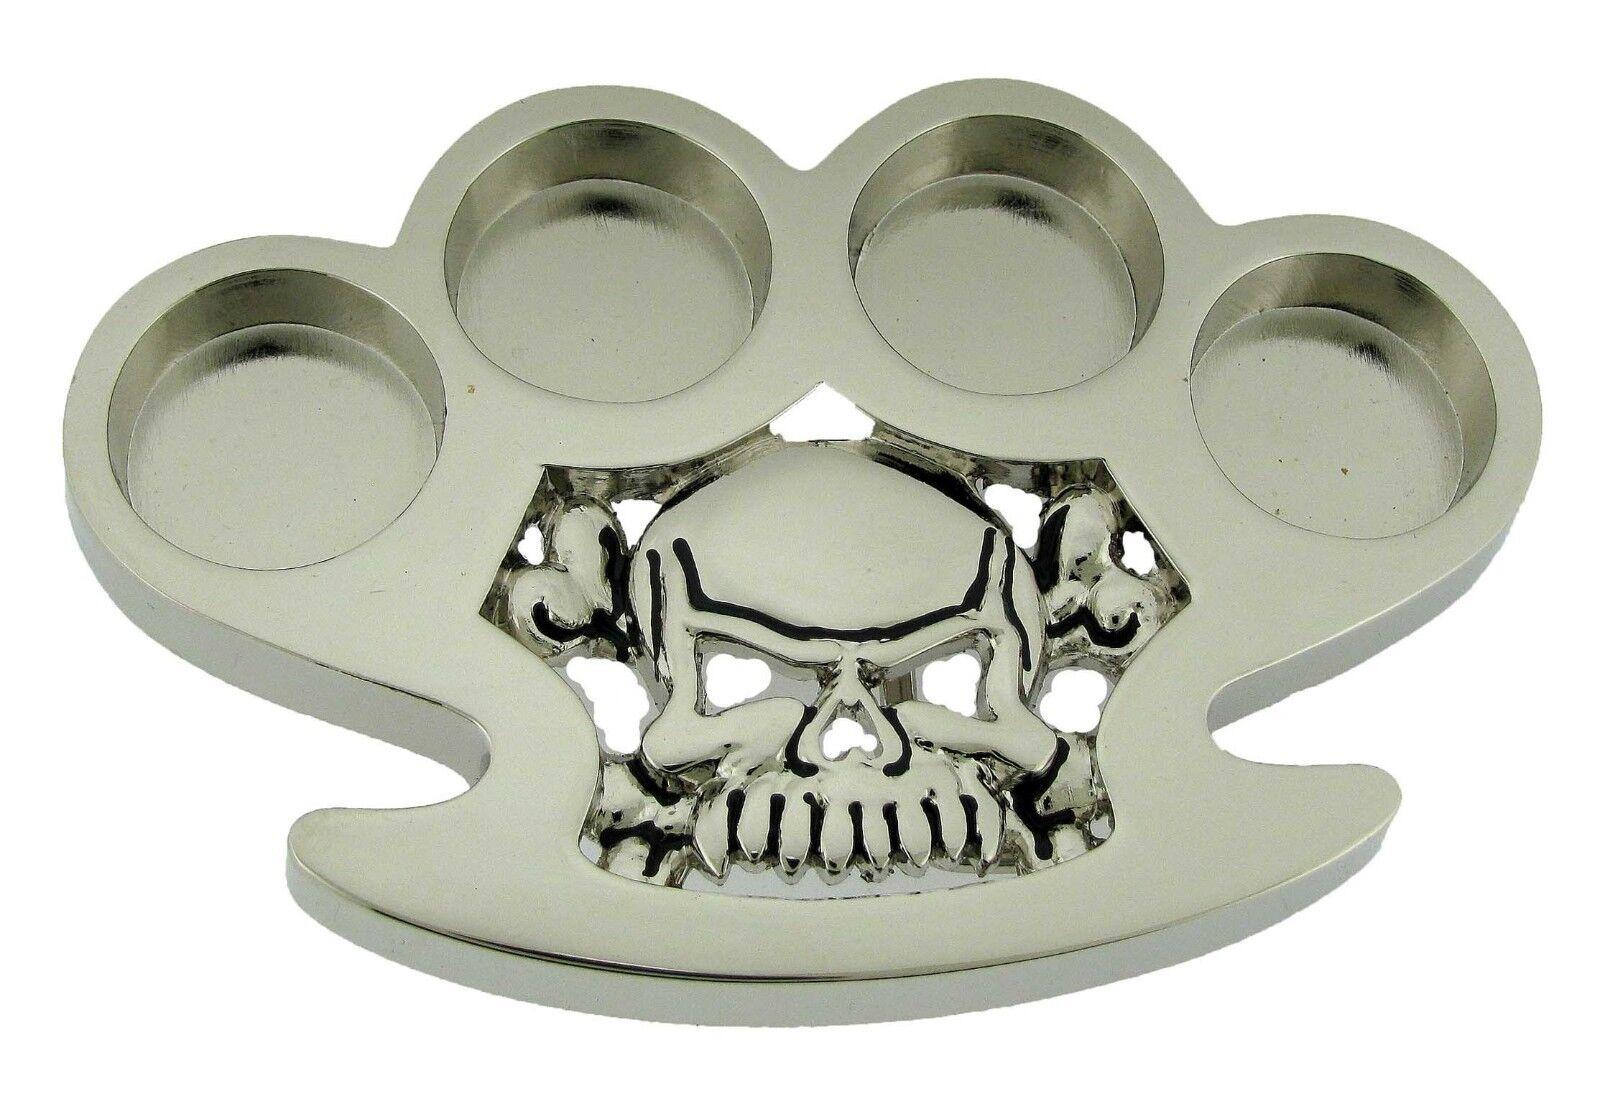 Rock Rebel Totenkopf Gürtelschnalle Silber Metal Knochen Halloween Pirat Kostüm